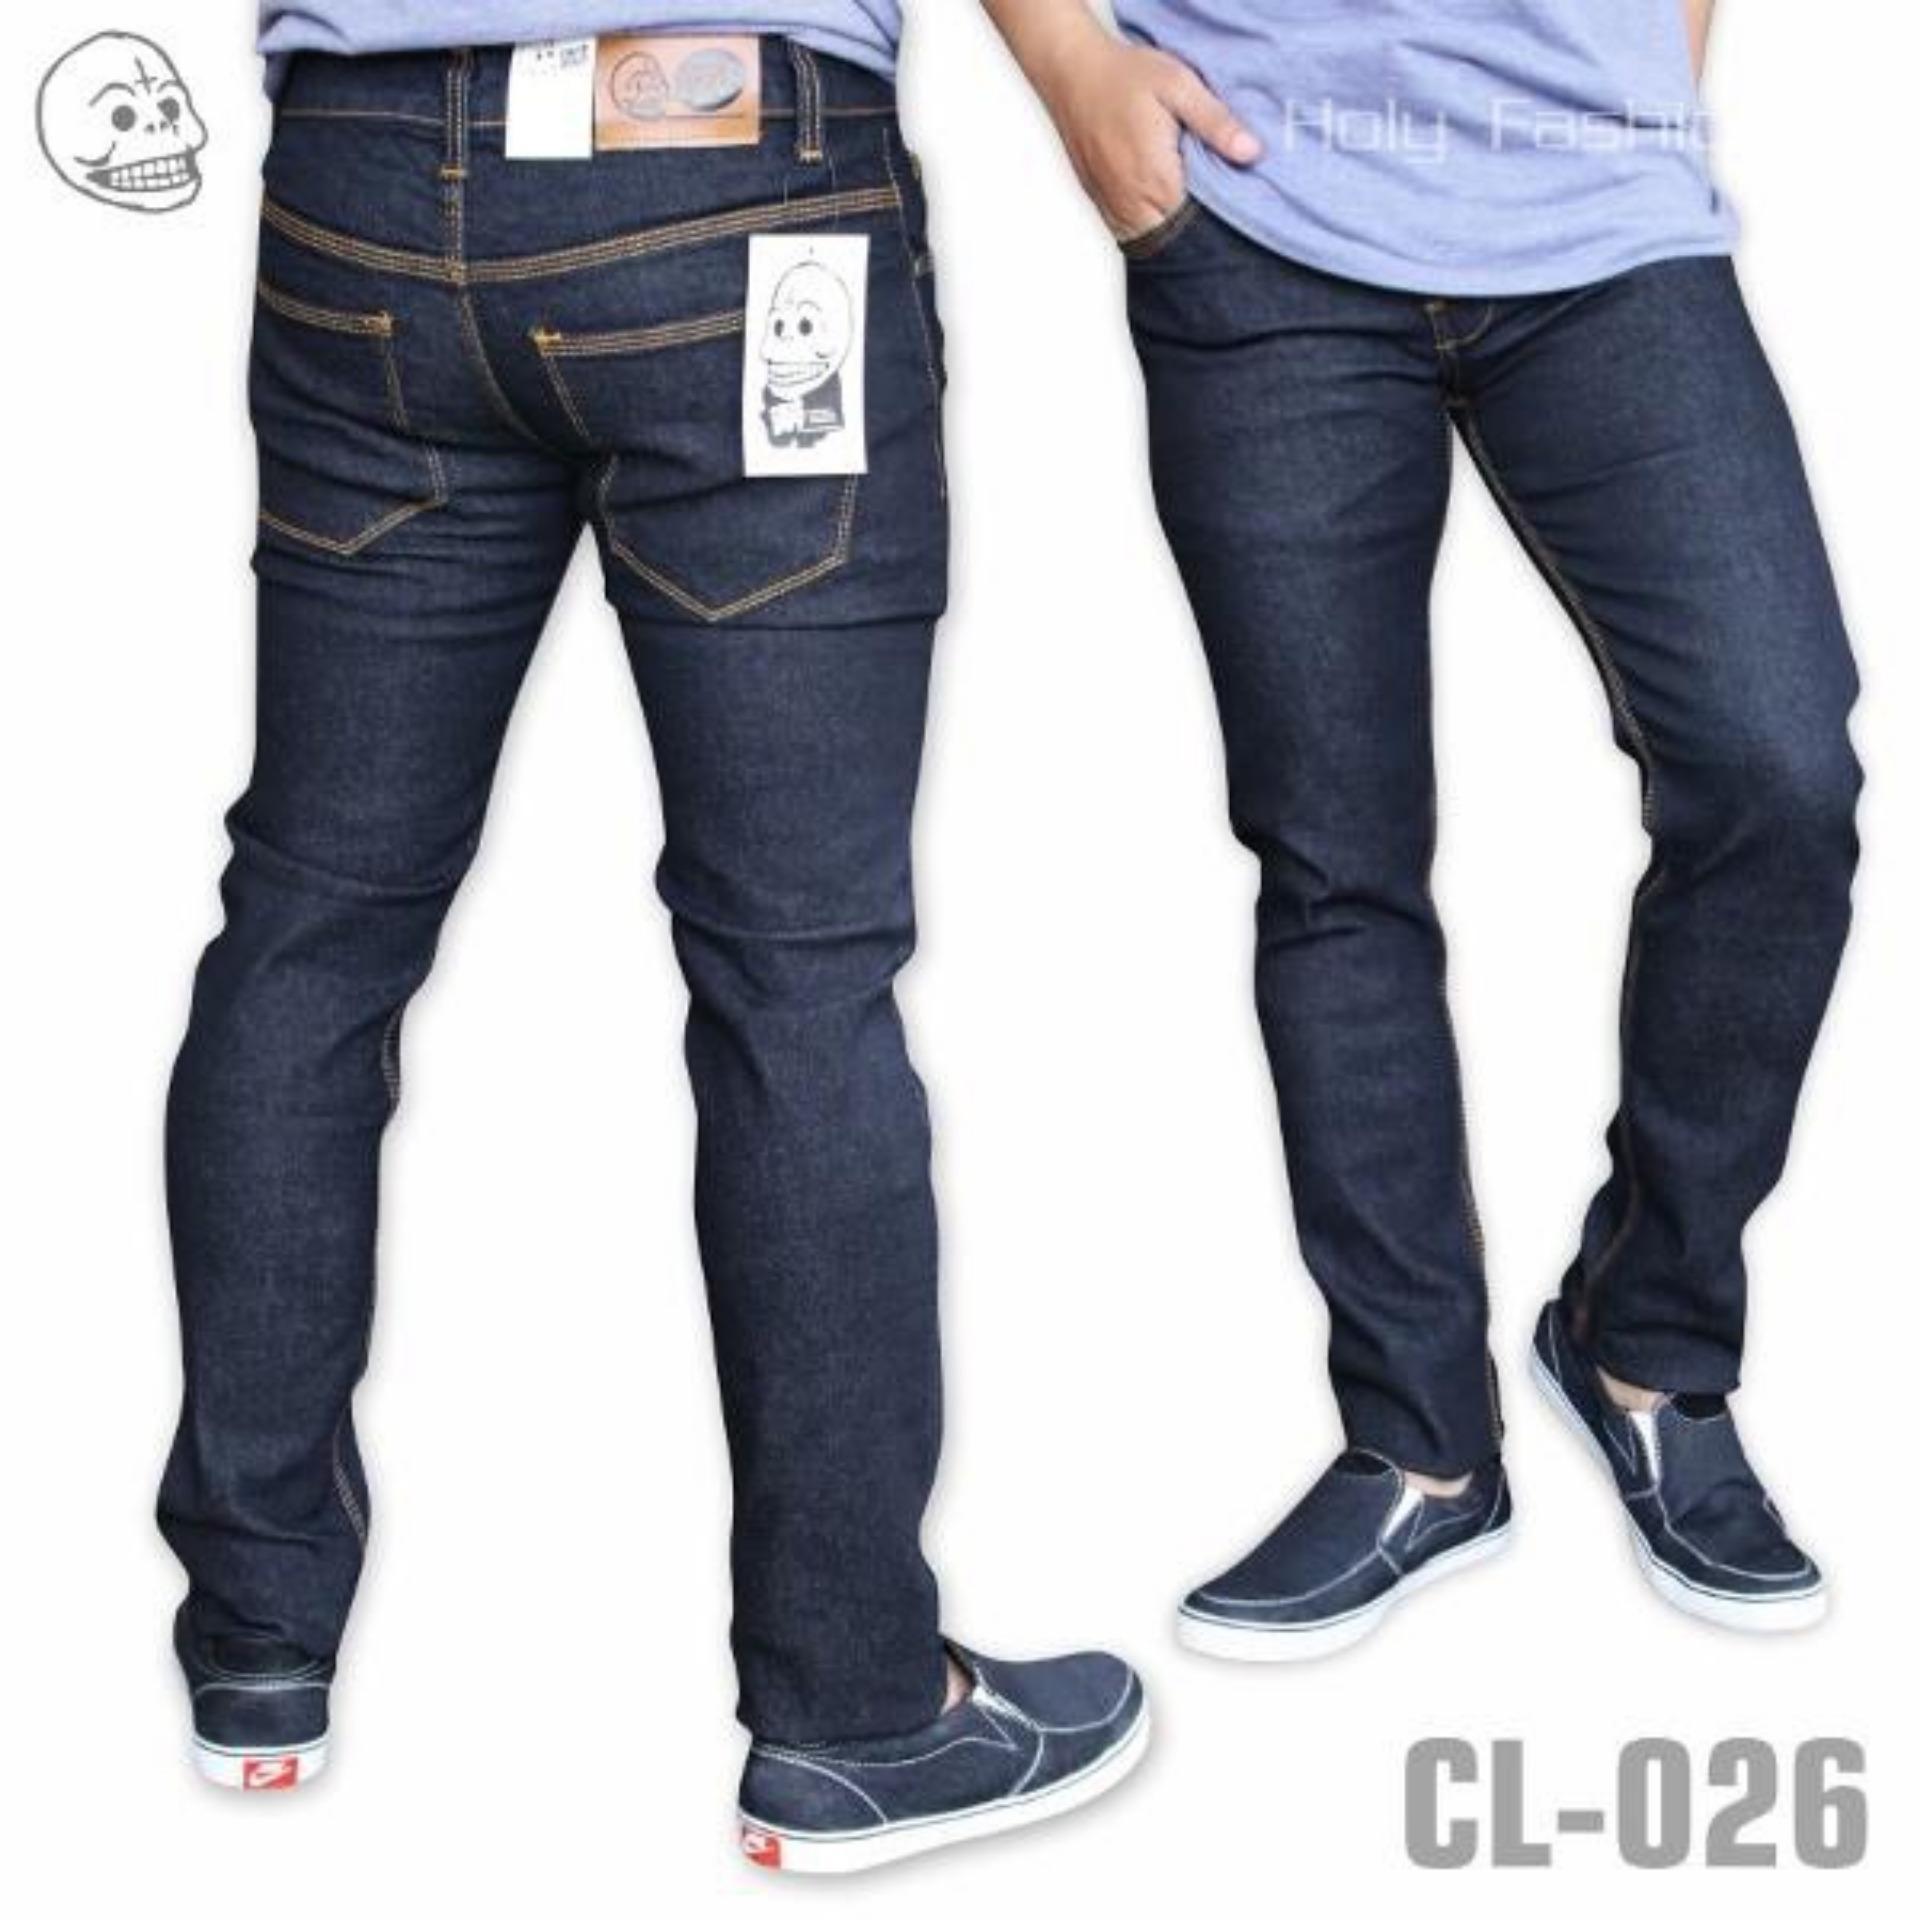 Celana PANJANG Jeans Slimfit Pria - Denim Stretch - Jeans Pensil Melar  - DONGKER